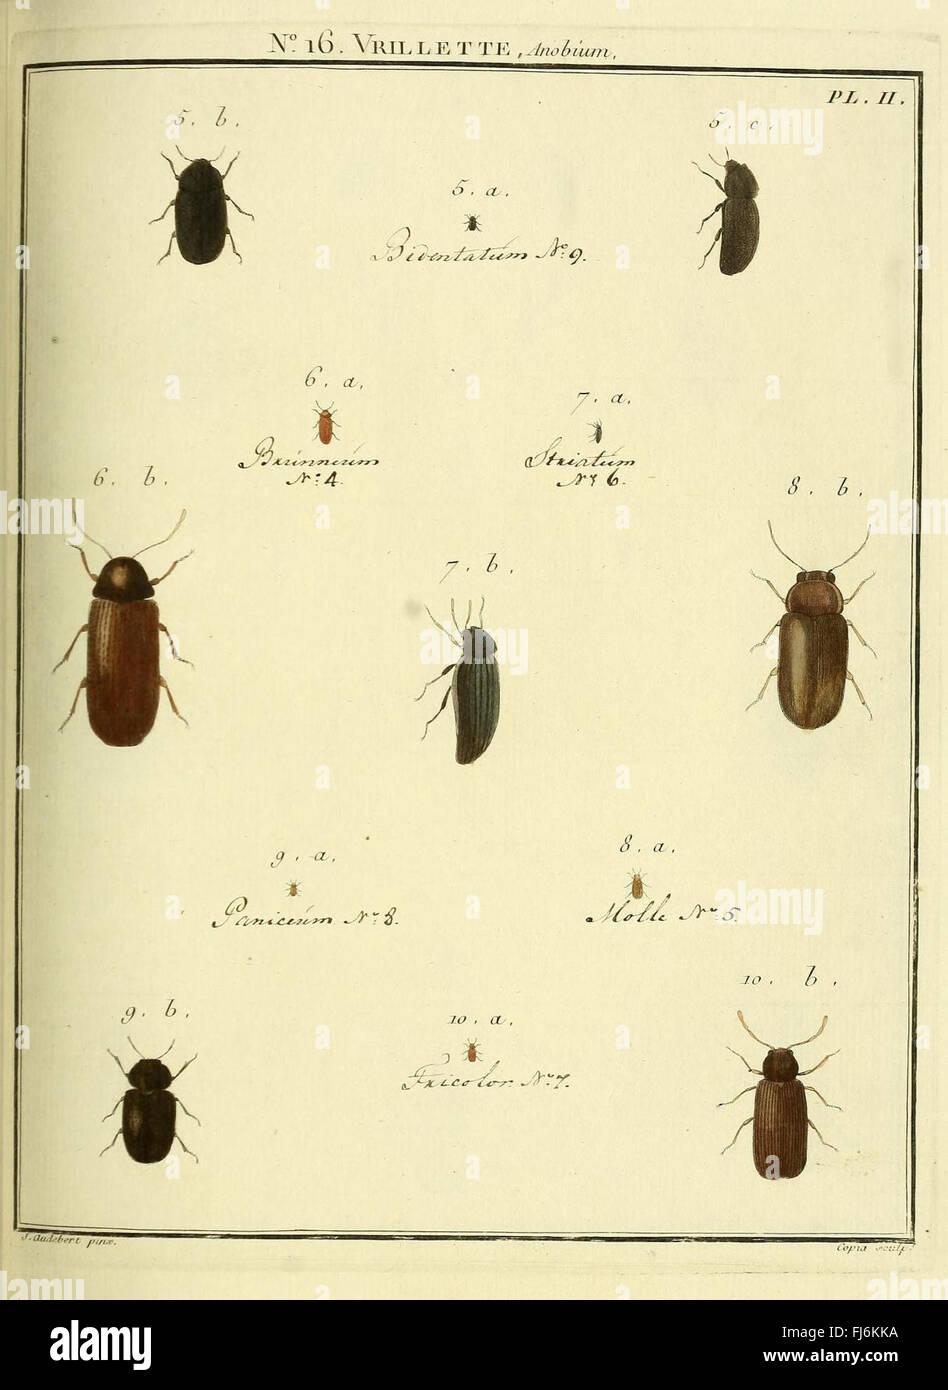 Entomologie, Ou, Histoire Naturelle des Insectes (Nr. 16 Vrillette PL II) Stockbild